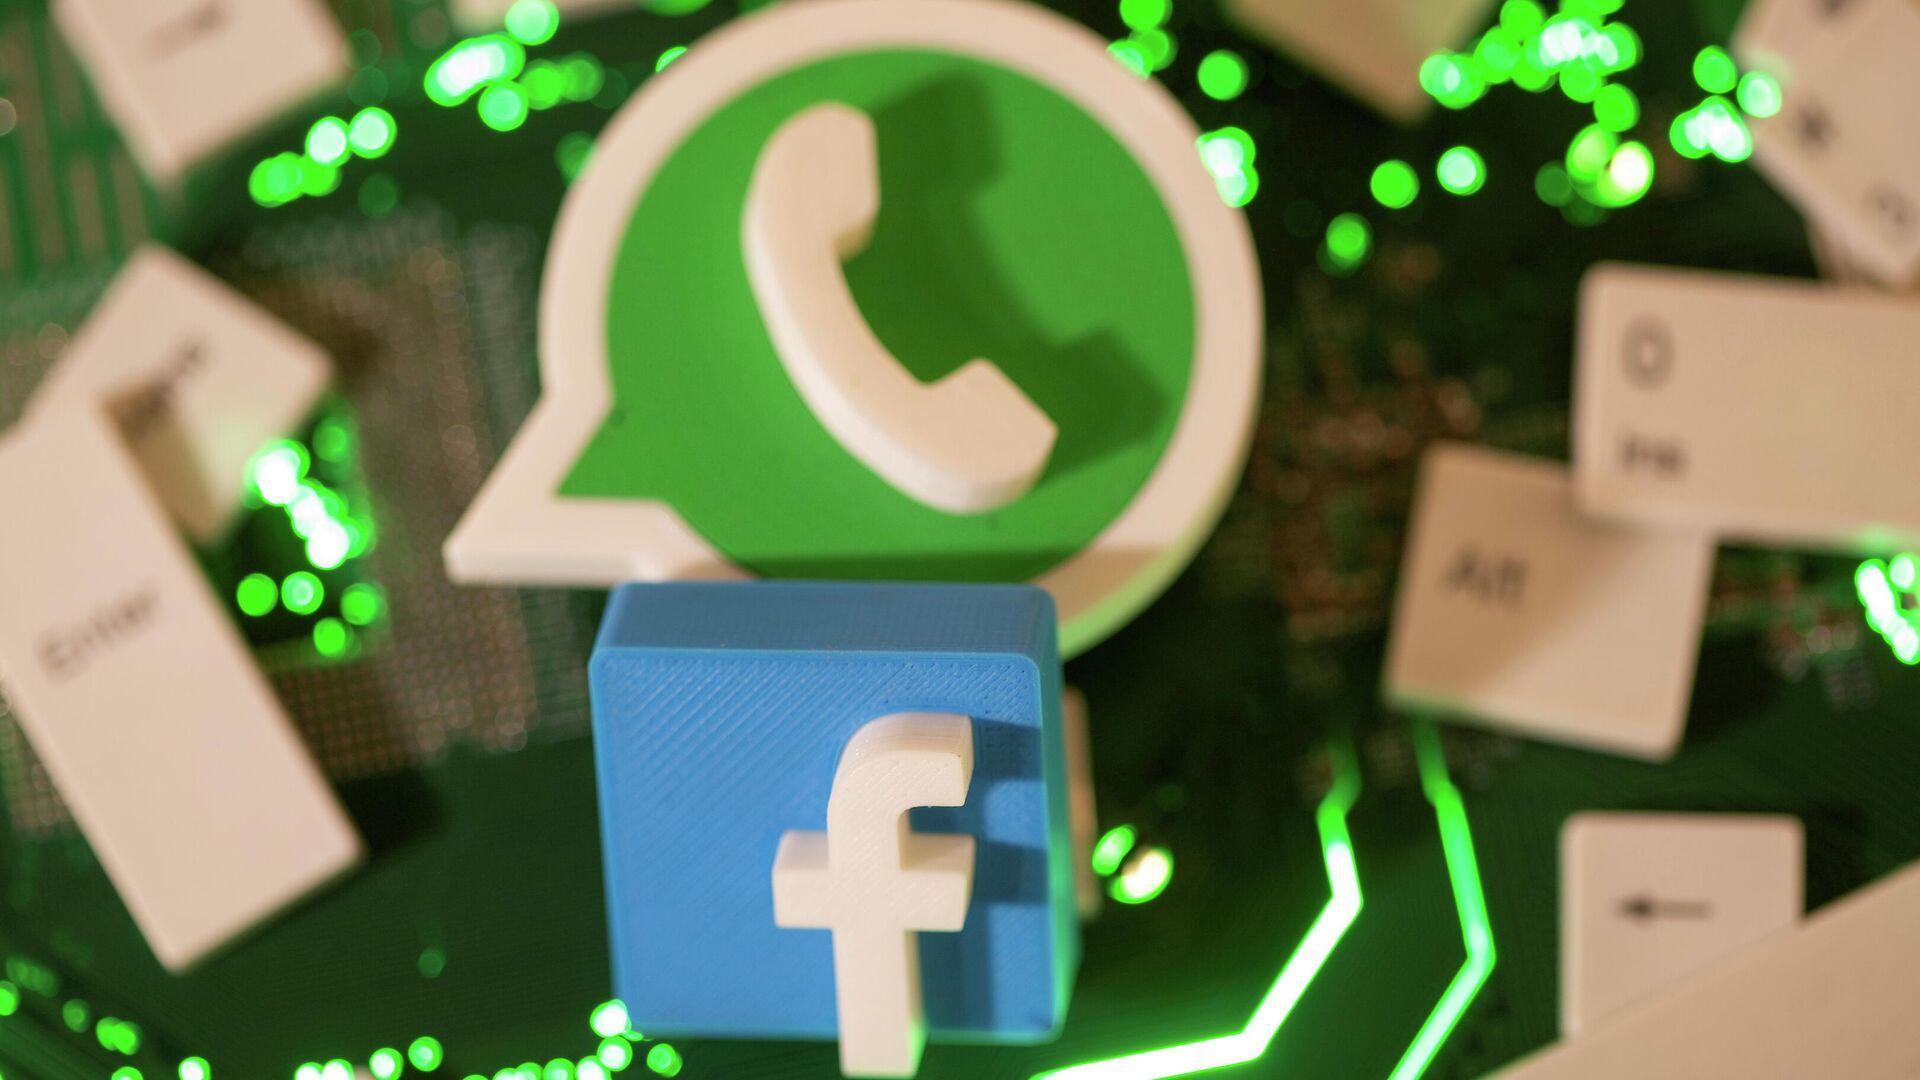 WhatsApp (Symbolbild) - SNA, 1920, 05.10.2021